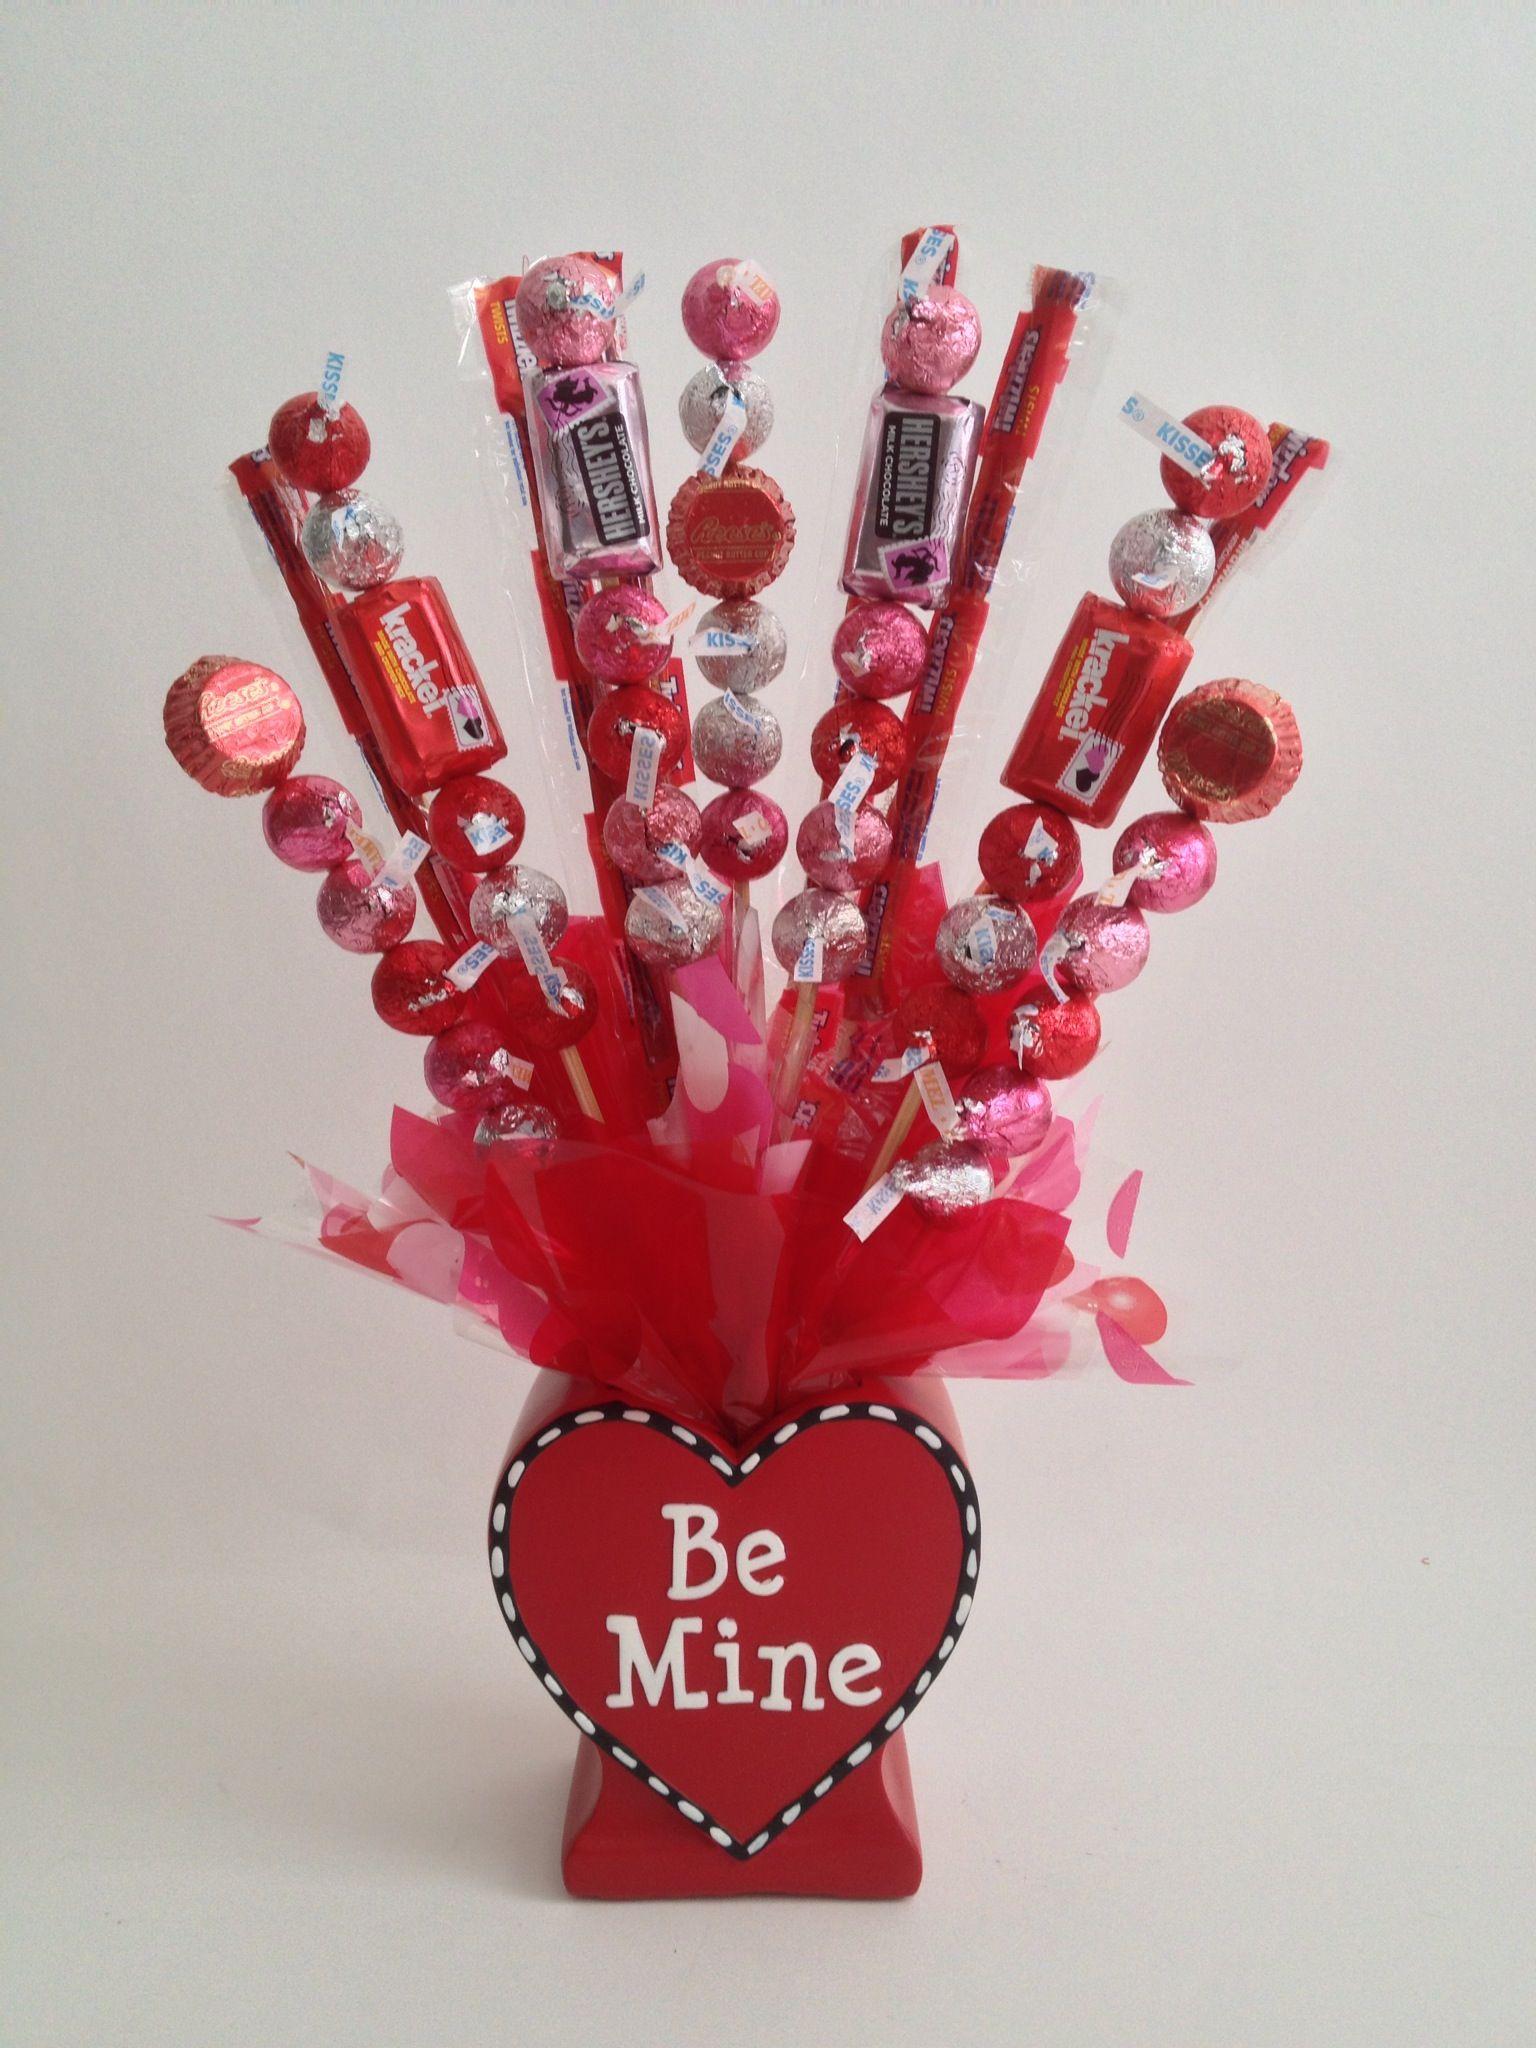 A Kiss Come True Valentine Gift Basket www.OhBowsGiftBaskets.com